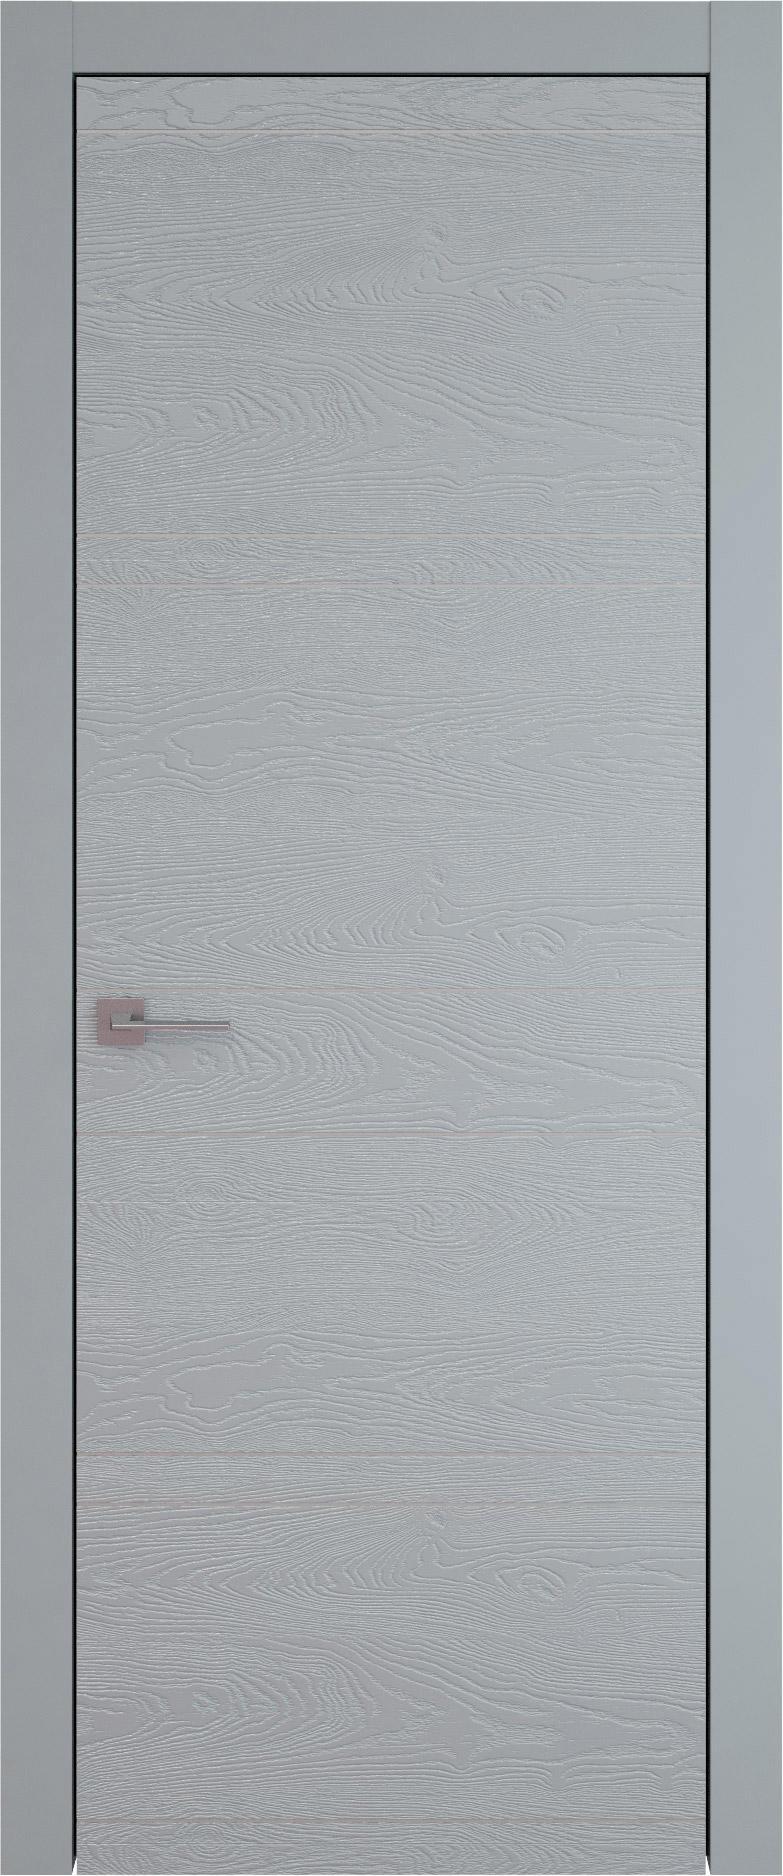 Tivoli Е-2 цвет - Серебристо-серая эмаль по шпону (RAL 7045) Без стекла (ДГ)